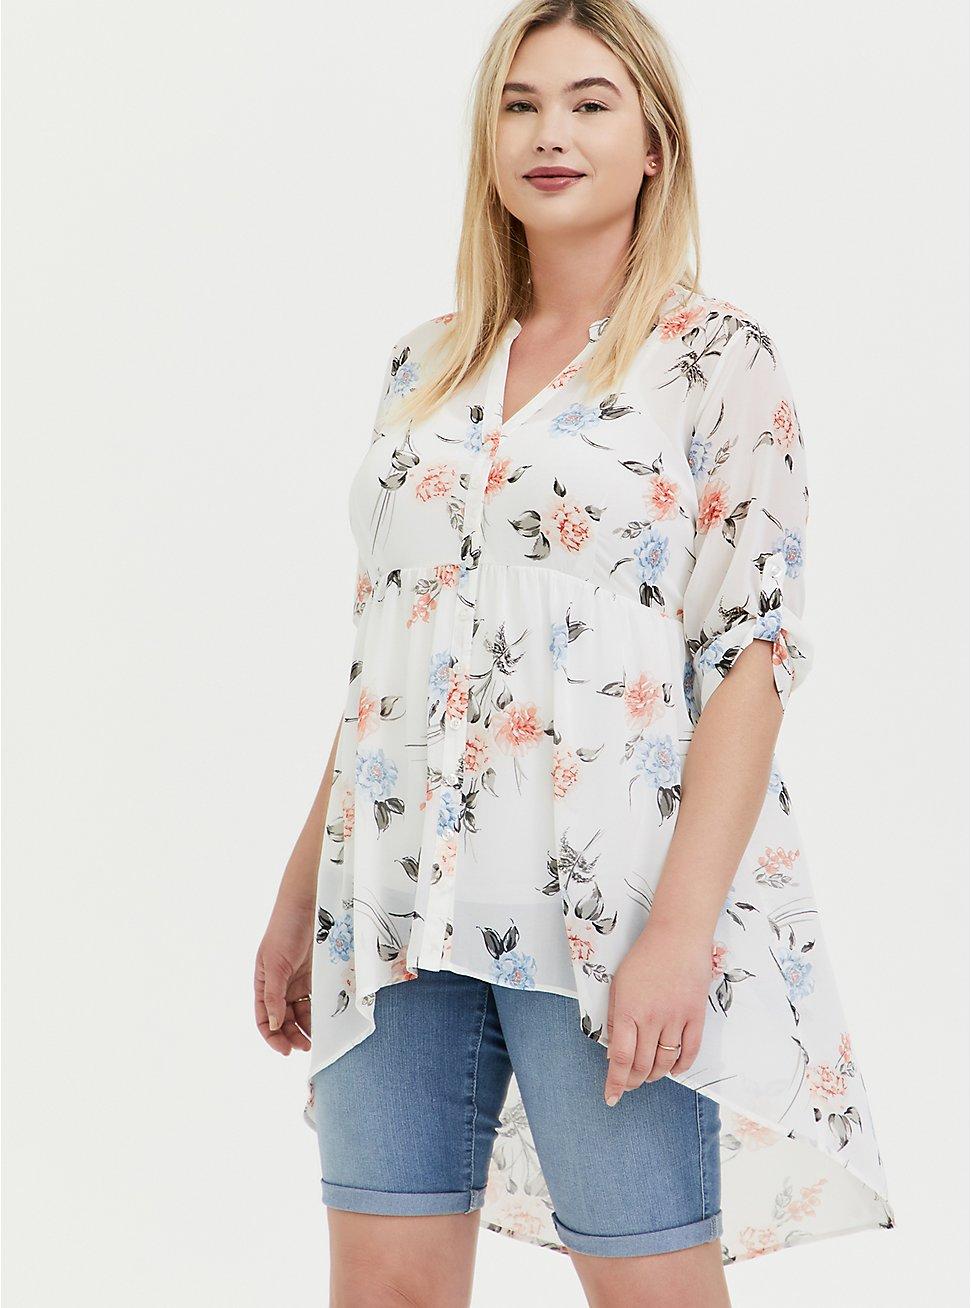 Lexie - White Floral Chiffon Hi-Lo Babydoll Tunic, FLORAL - WHITE, hi-res